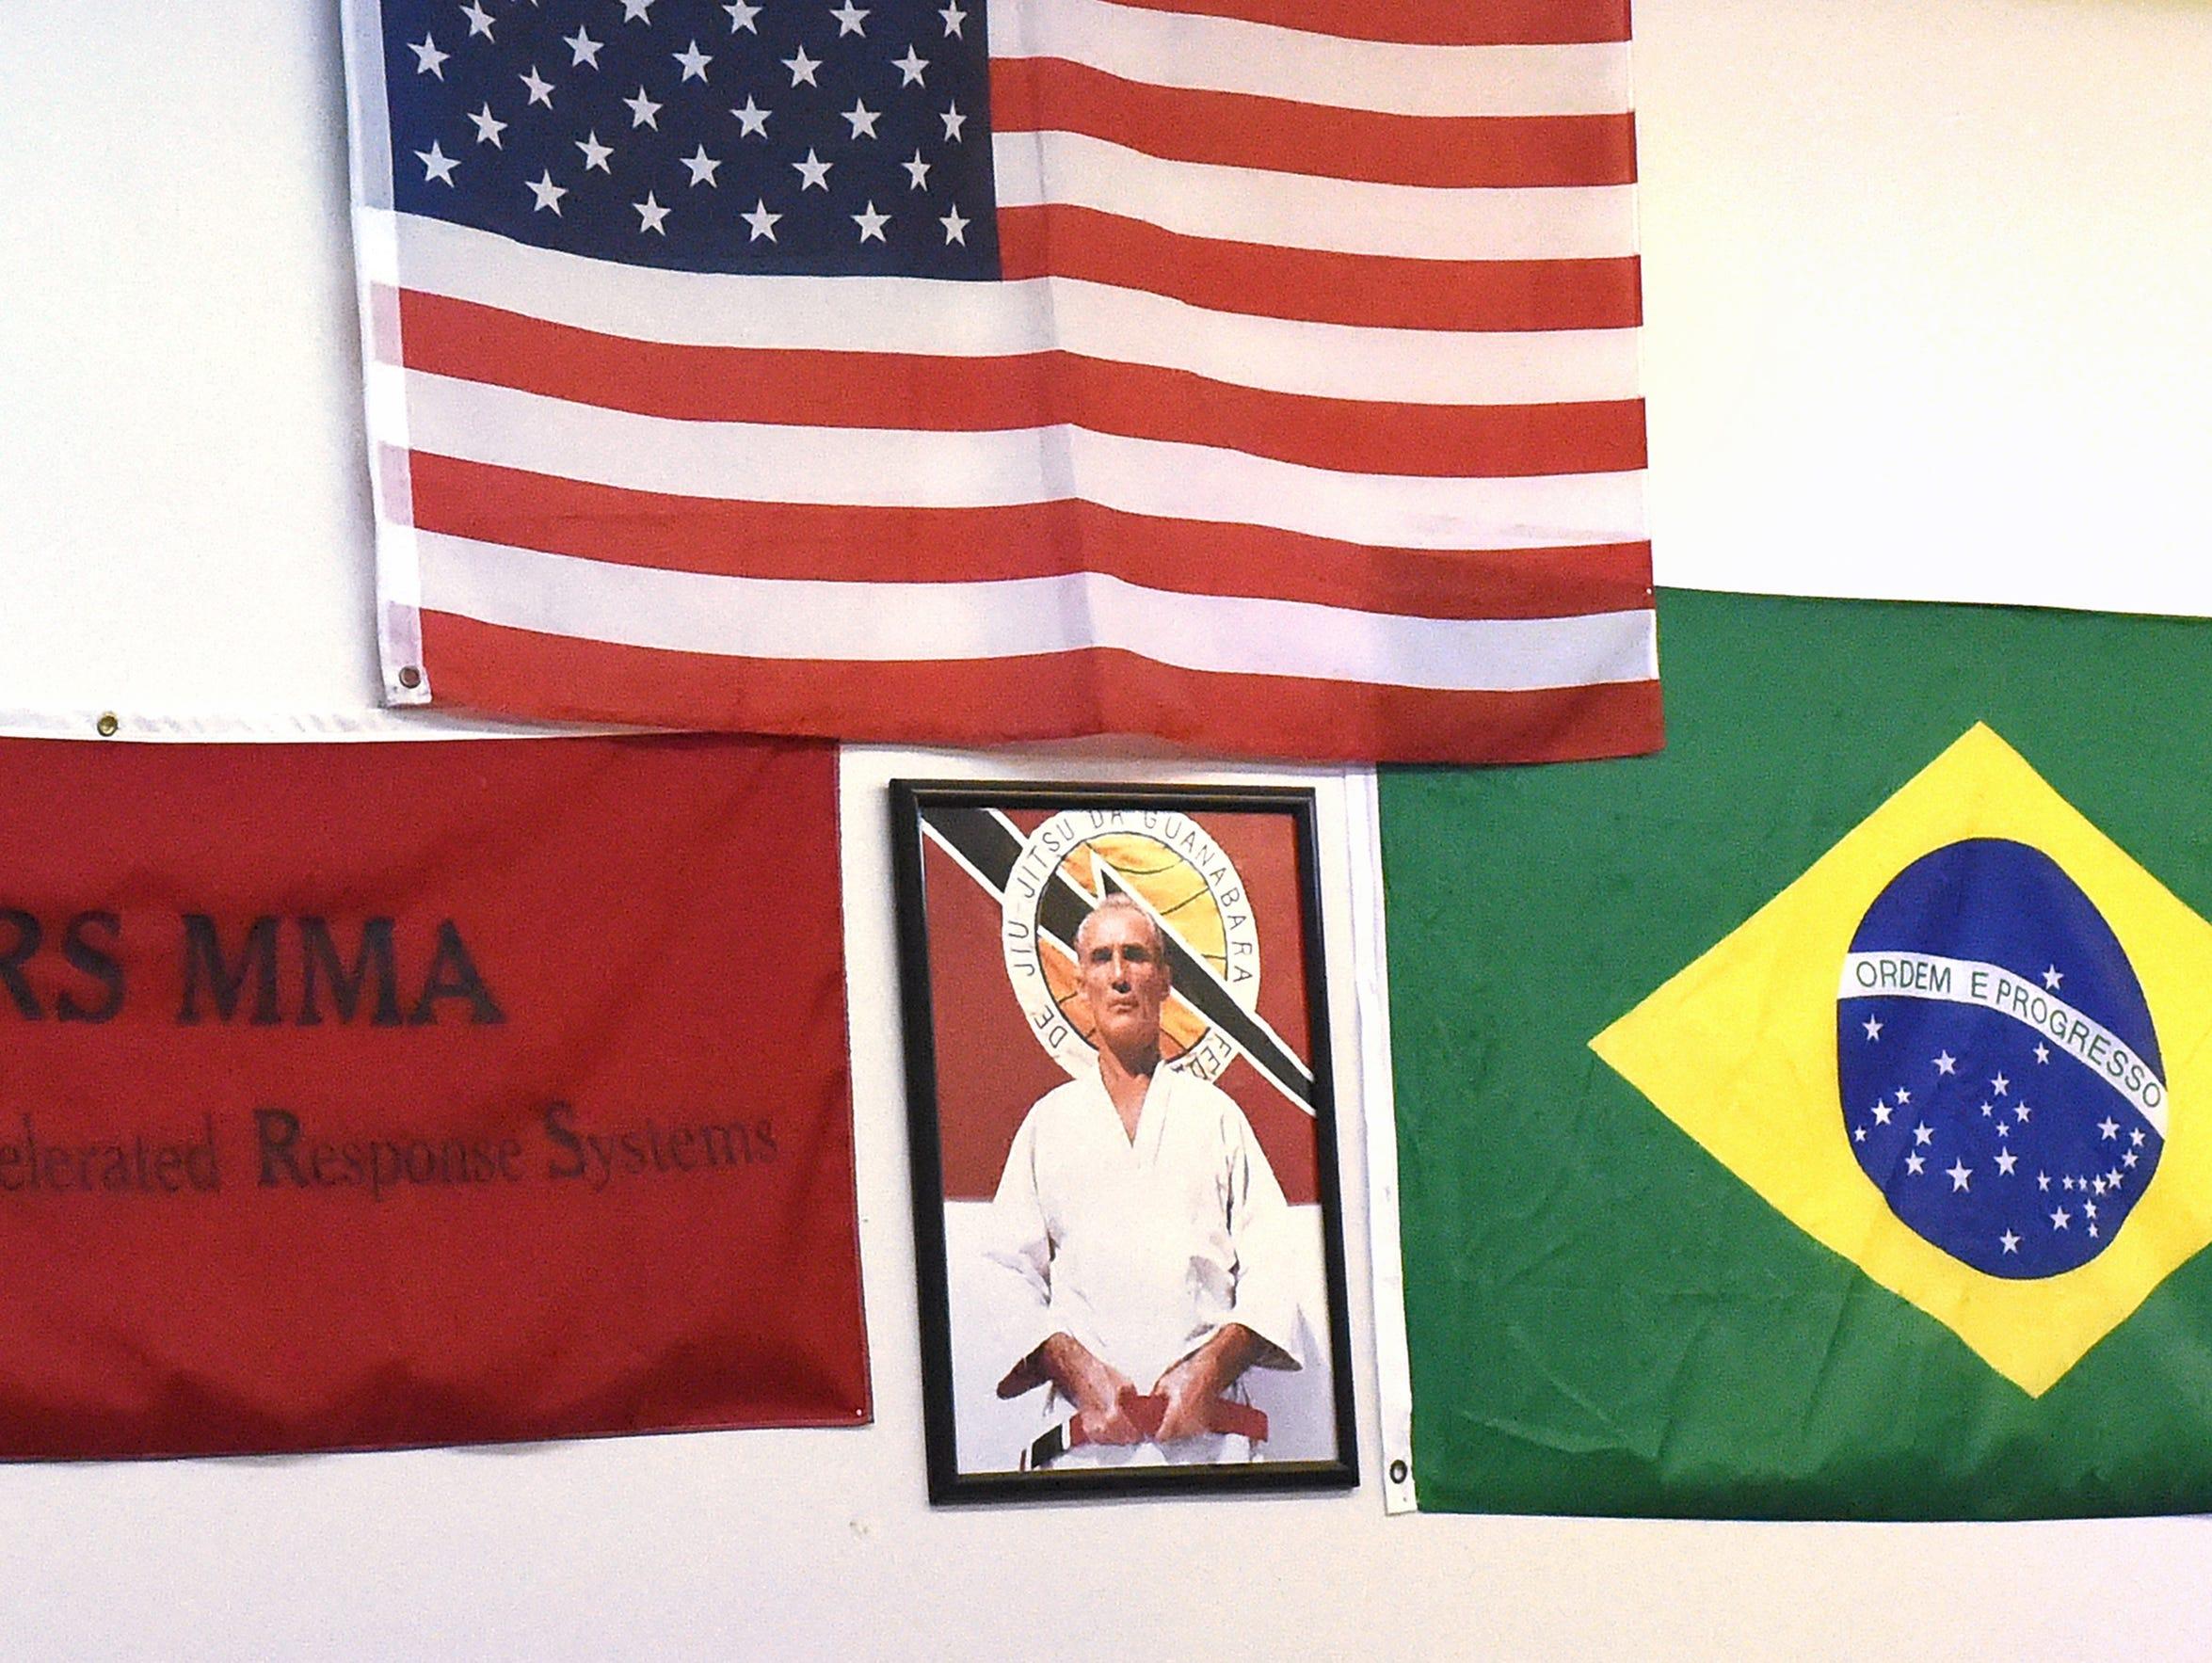 A photo of Brazilian martial artist HŽlio Gracie, father